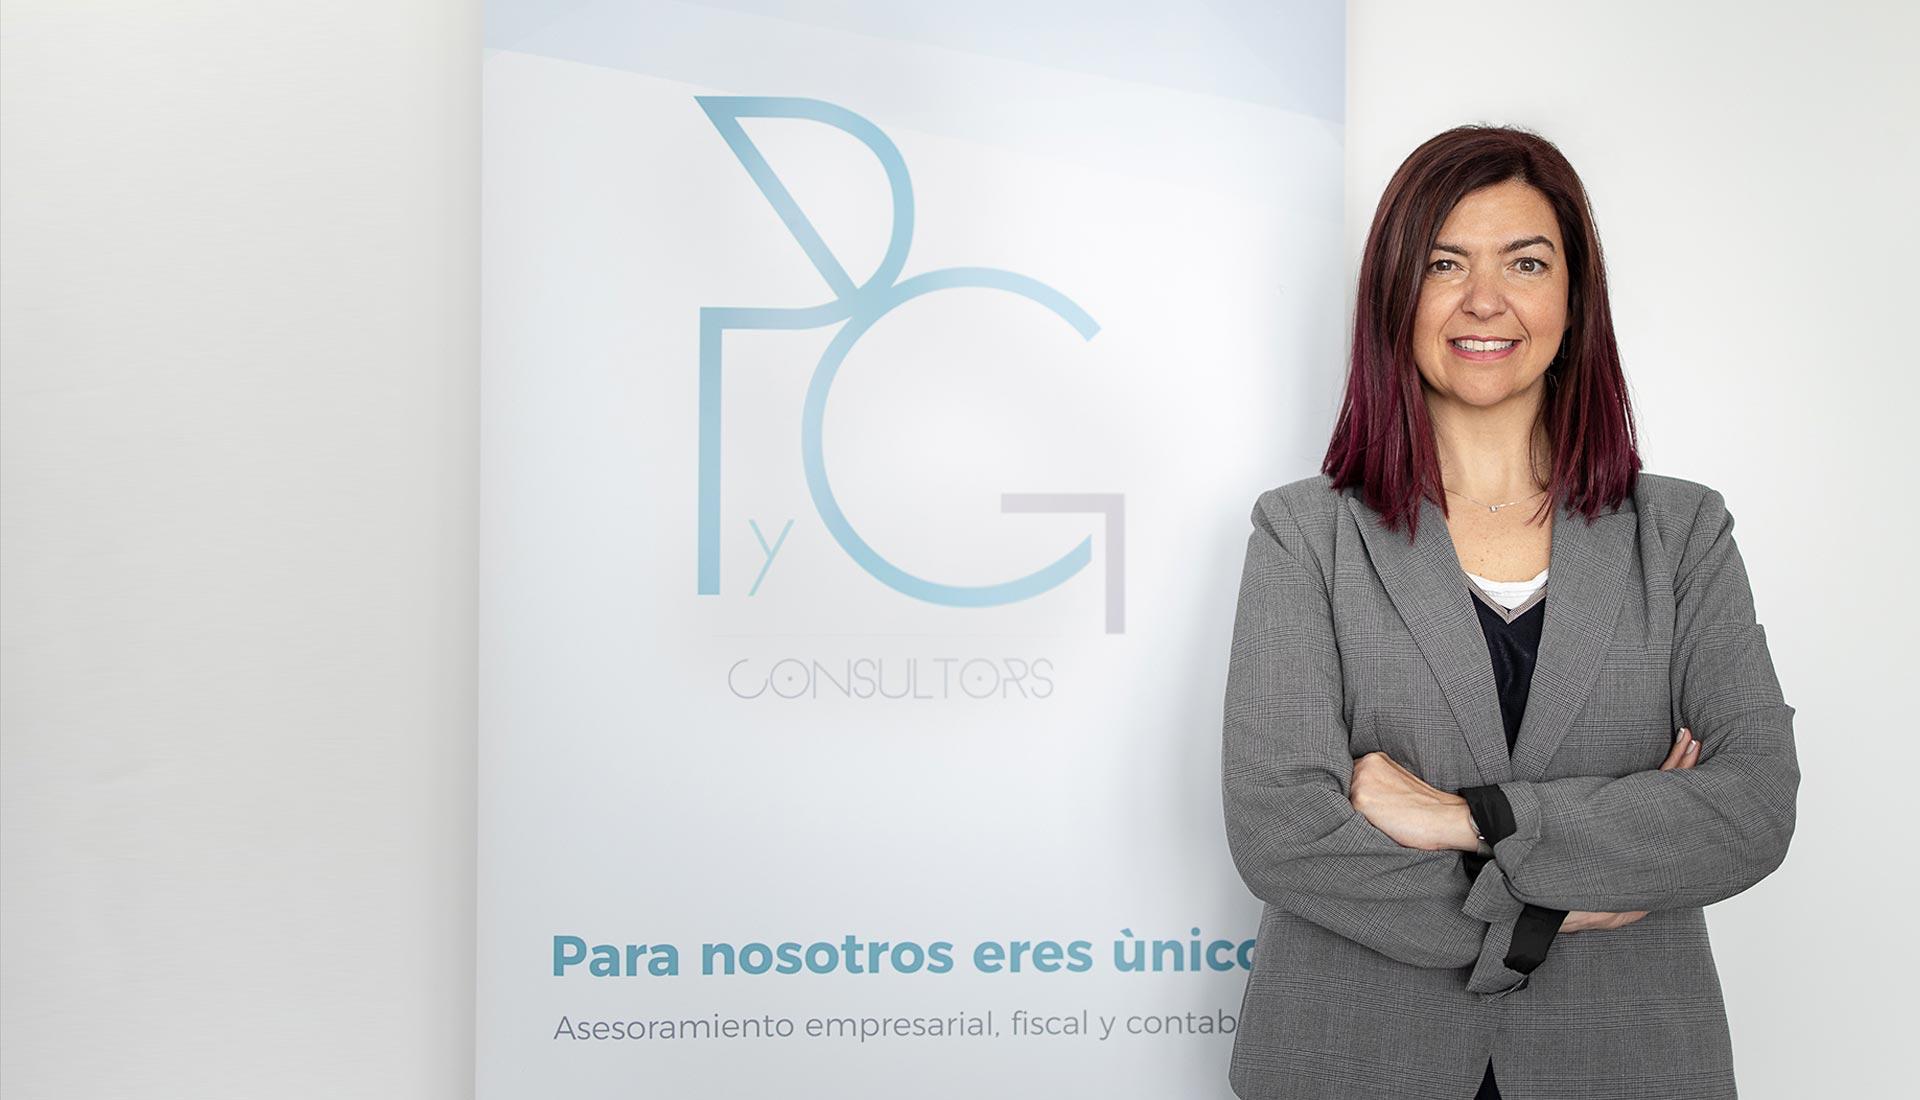 Pyg consultors